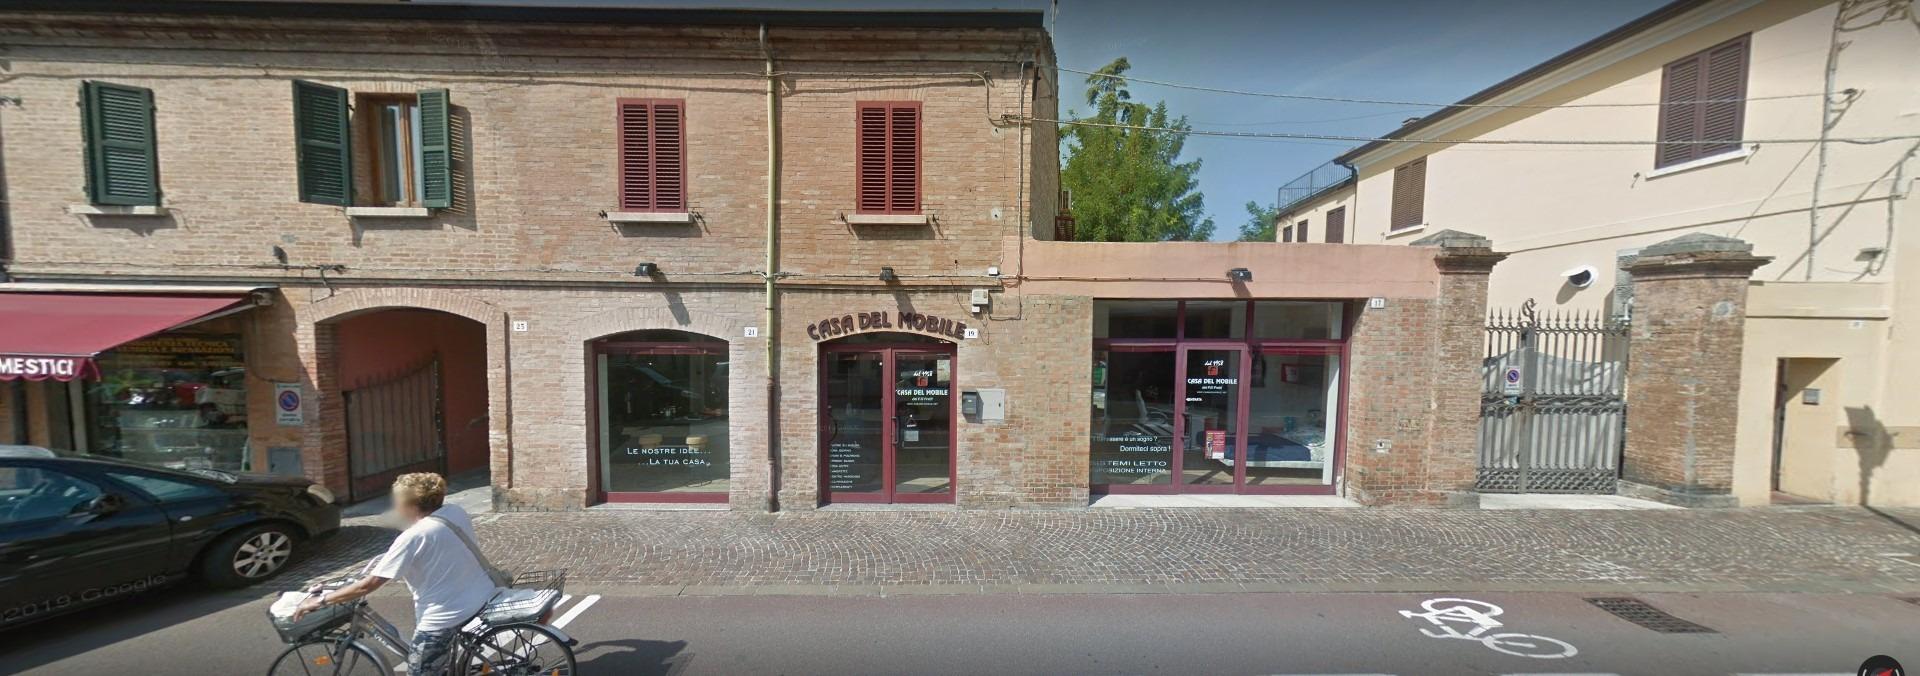 Punto vendita Scandola a Rimini